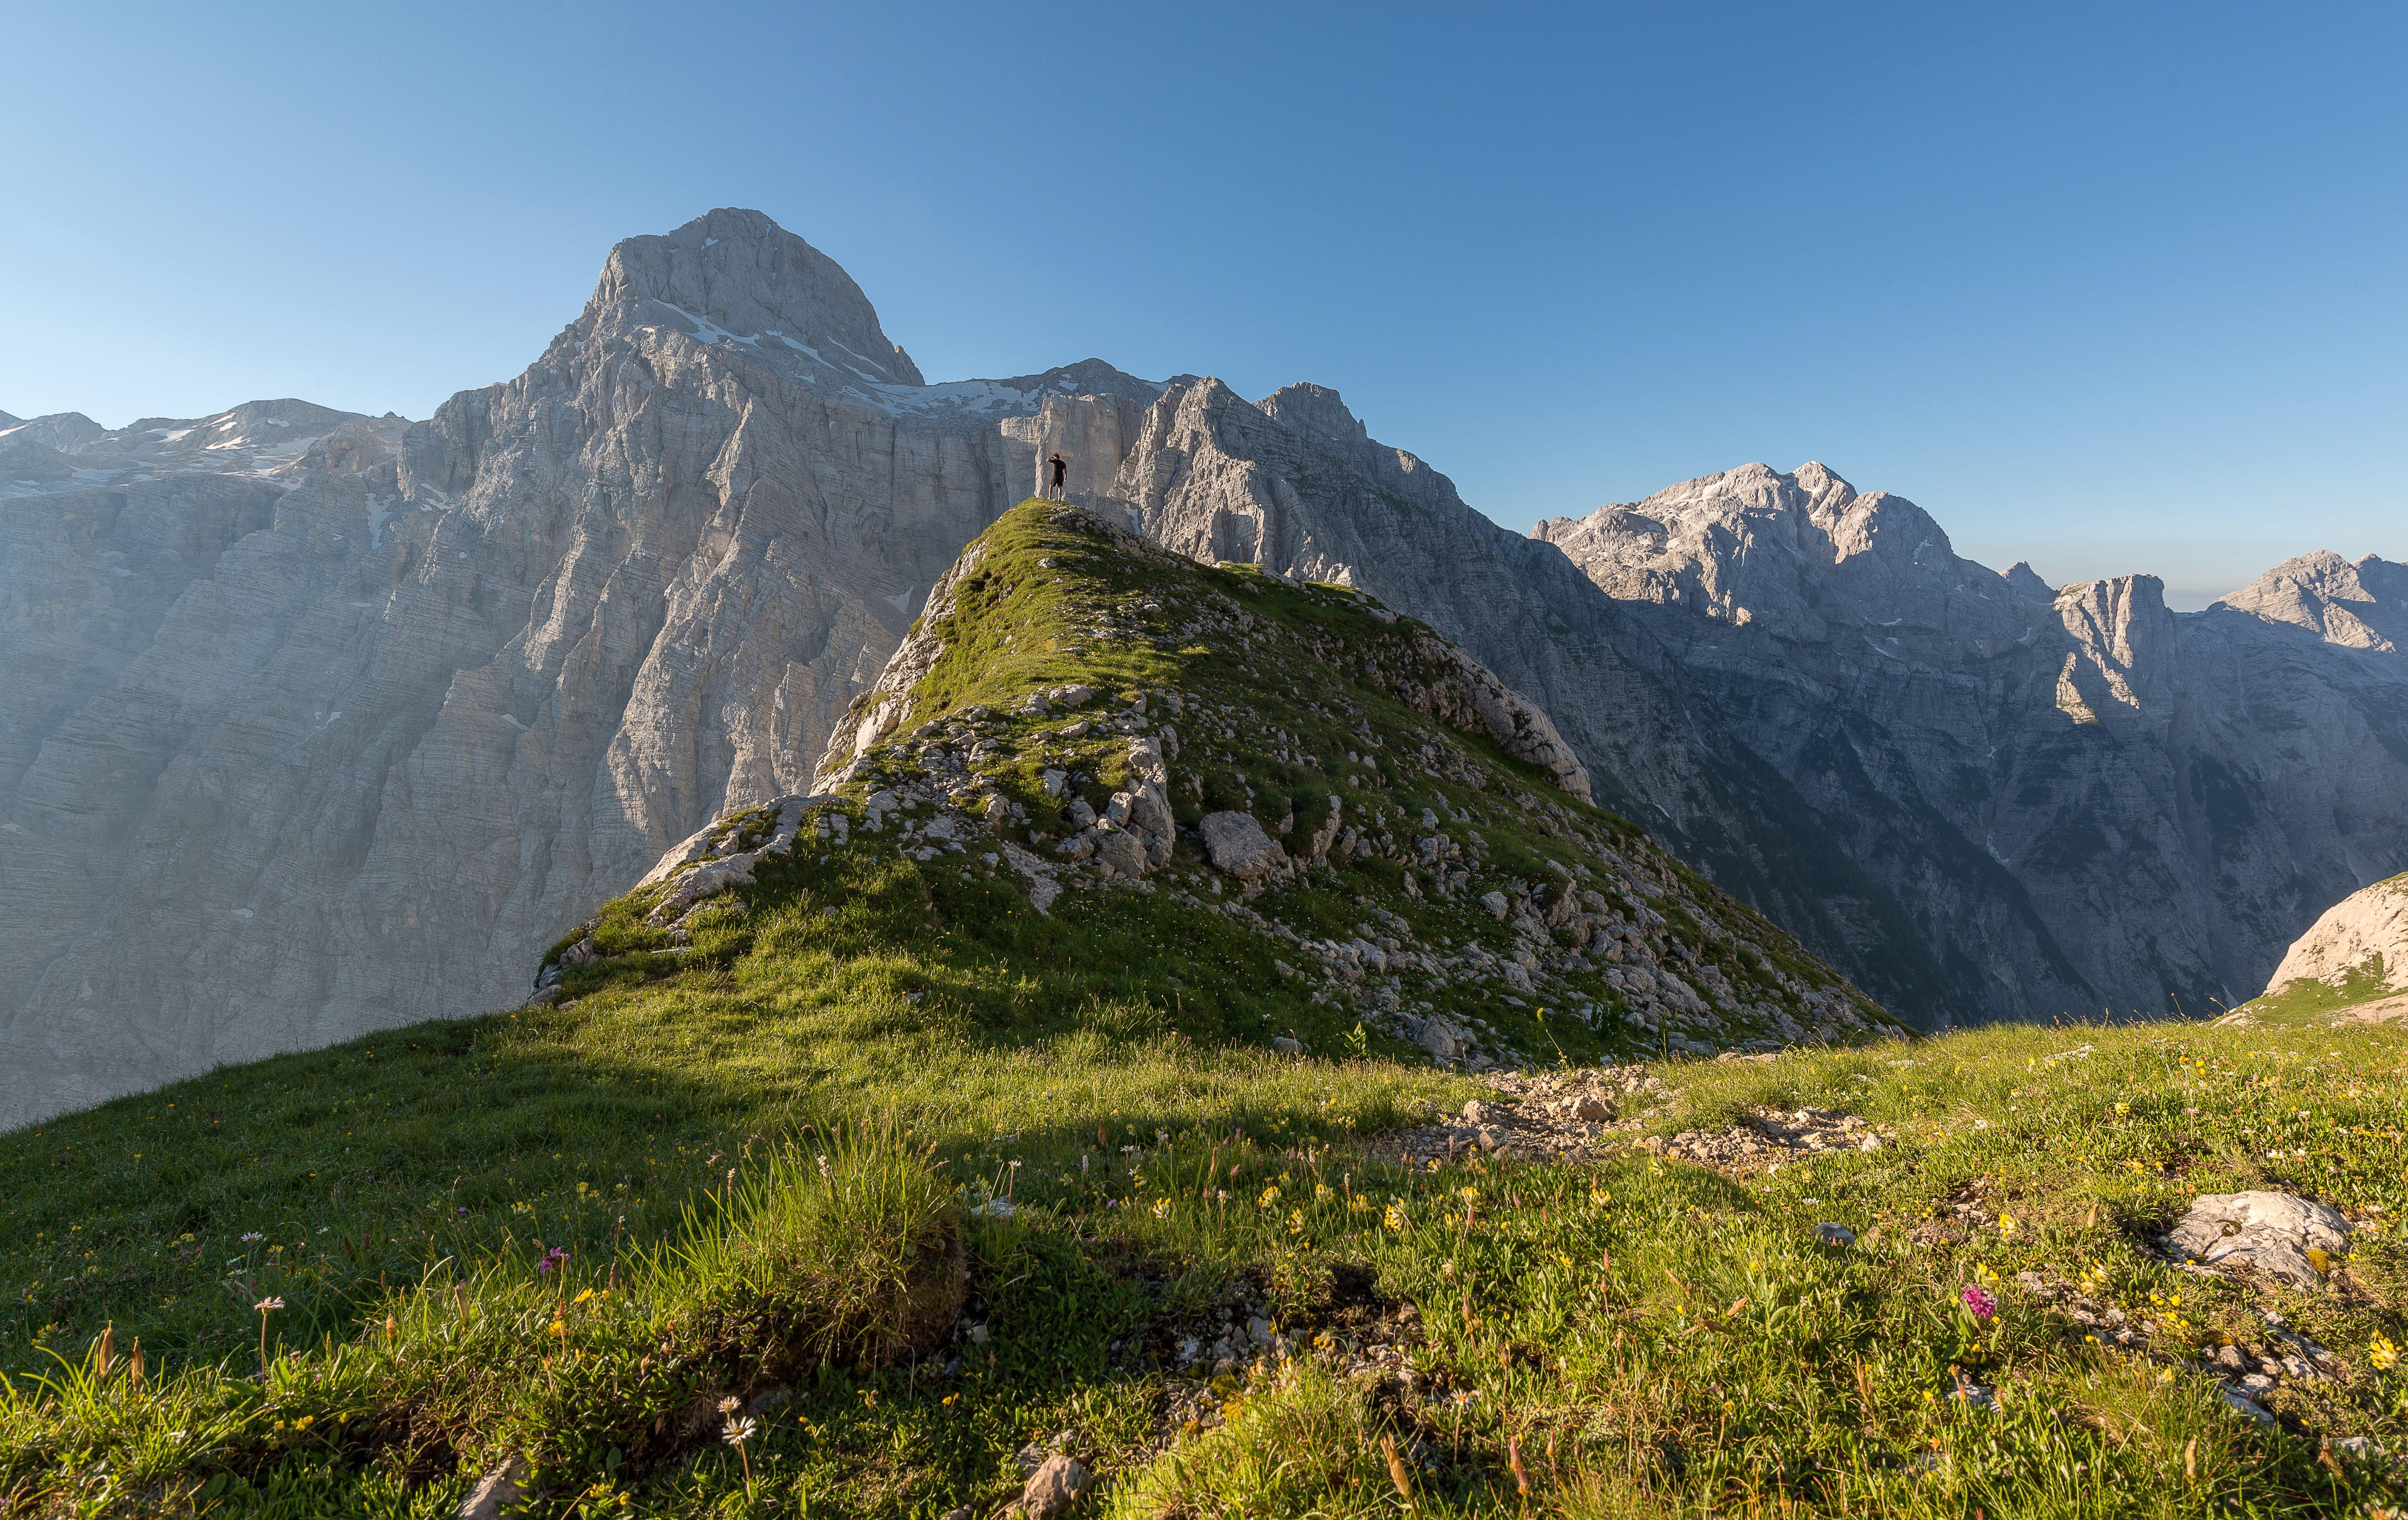 Fotos de stock gratuitas de Alpes, alpinismo, alto, ascender